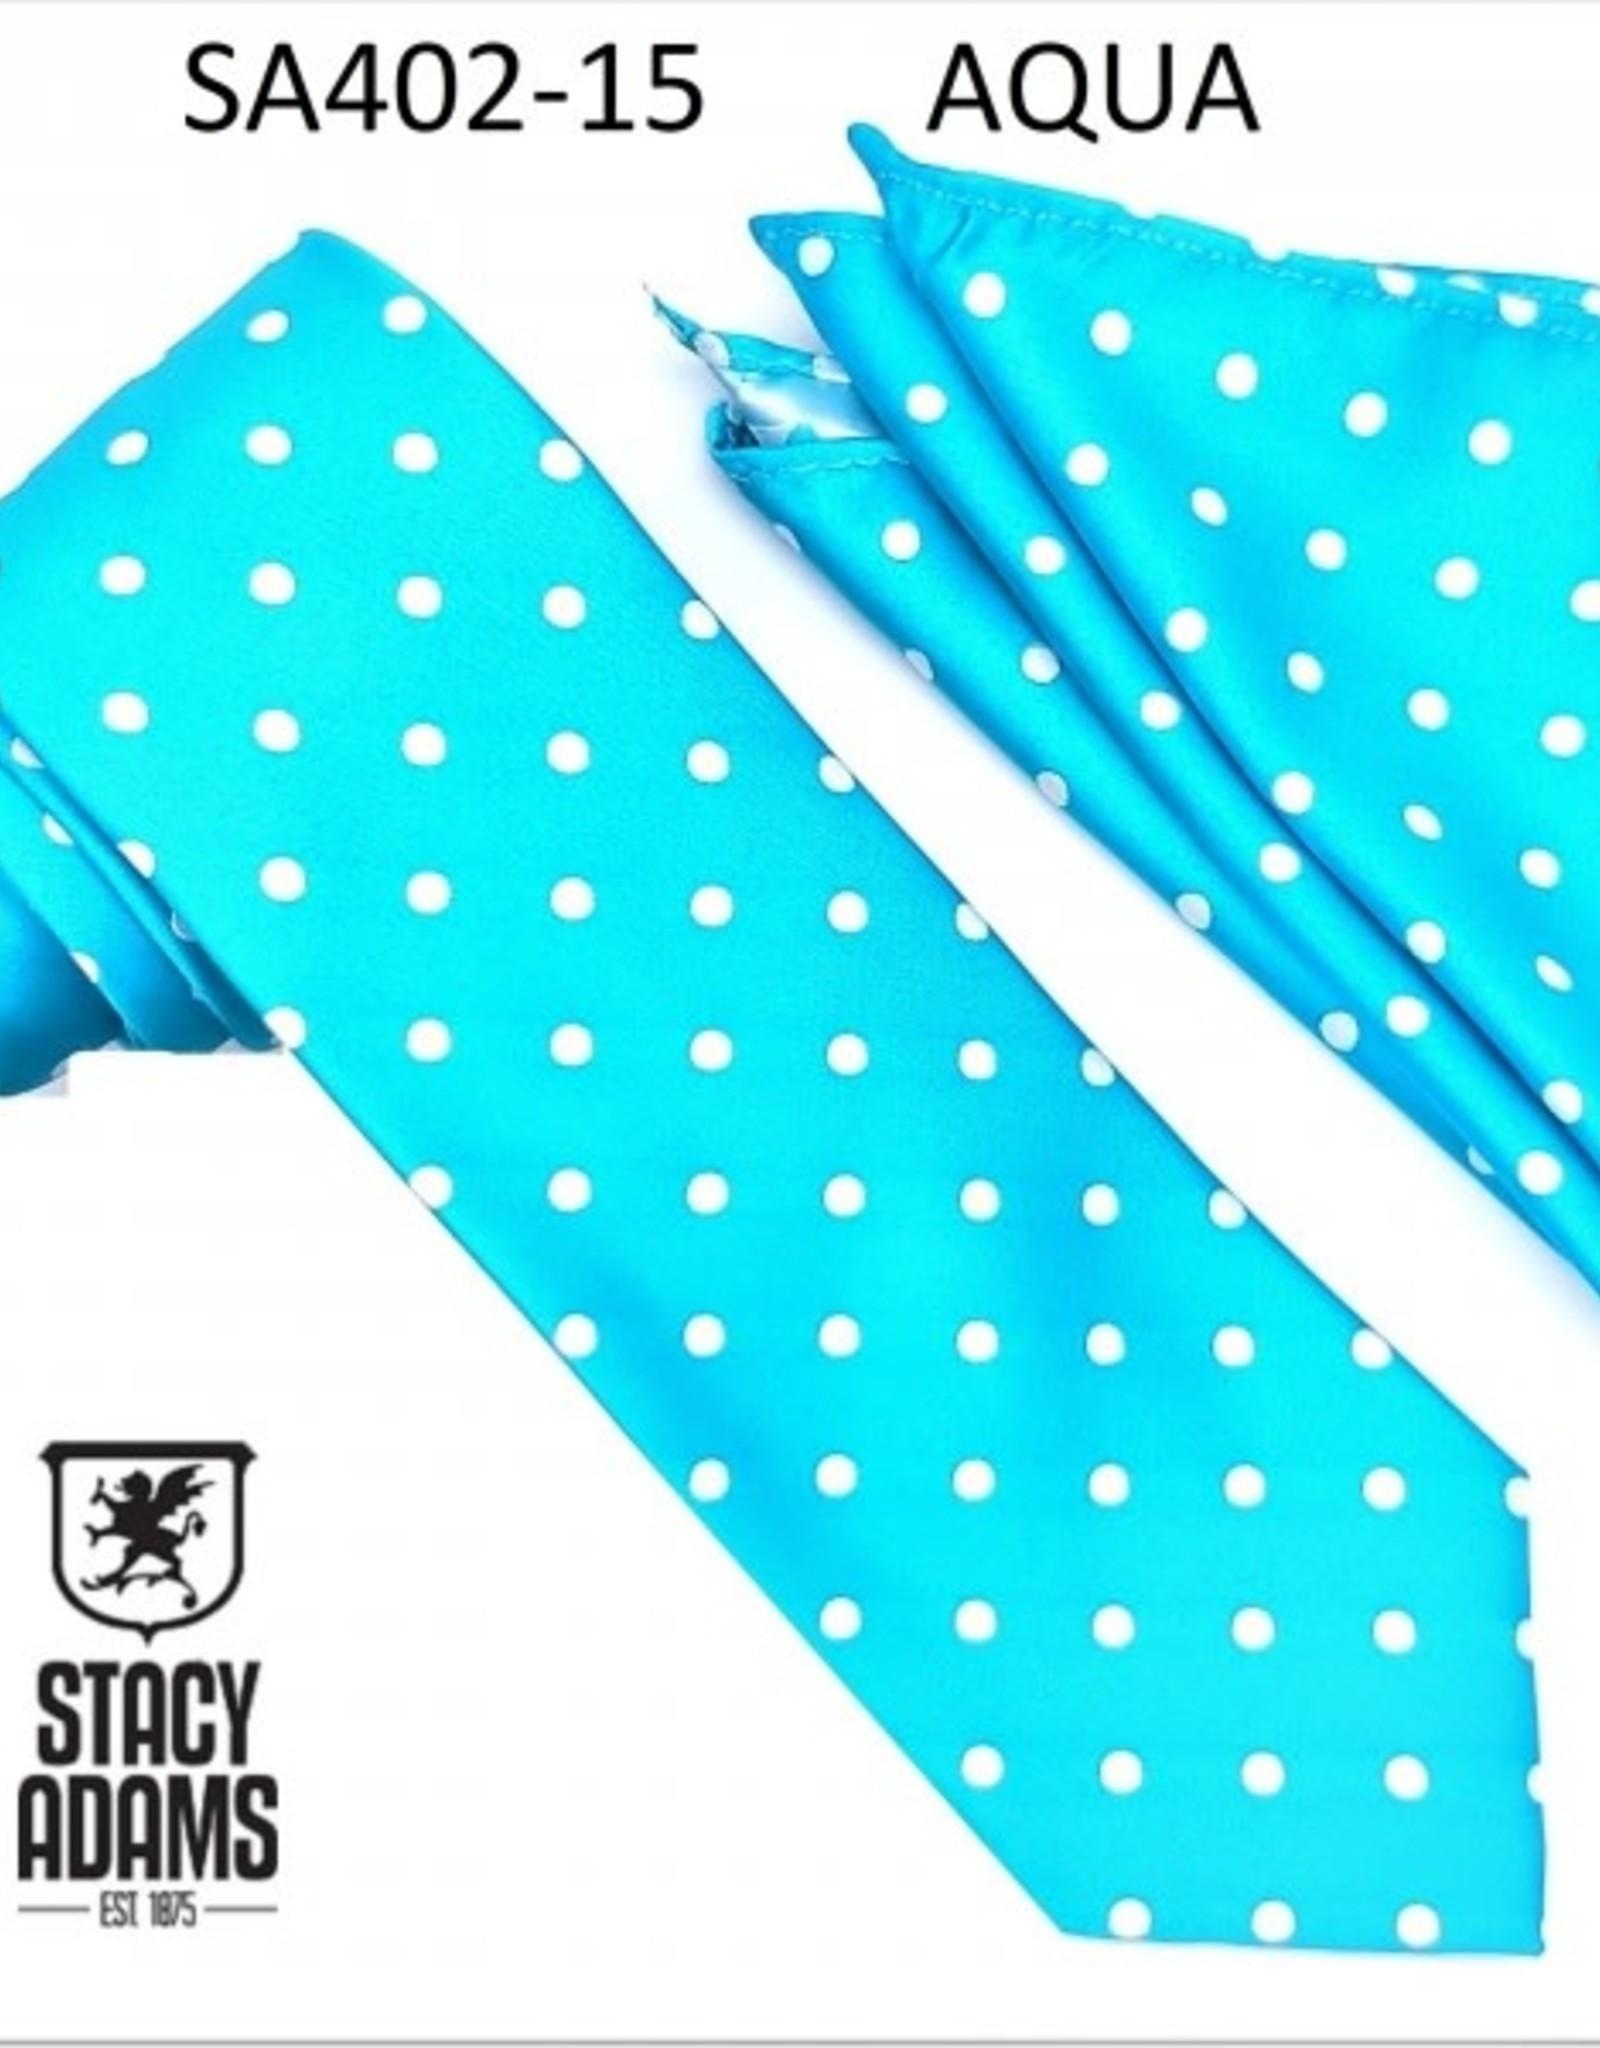 Stacy Adams Tie Stacy Adams Reg PolkaDot sa402-15 Aqua